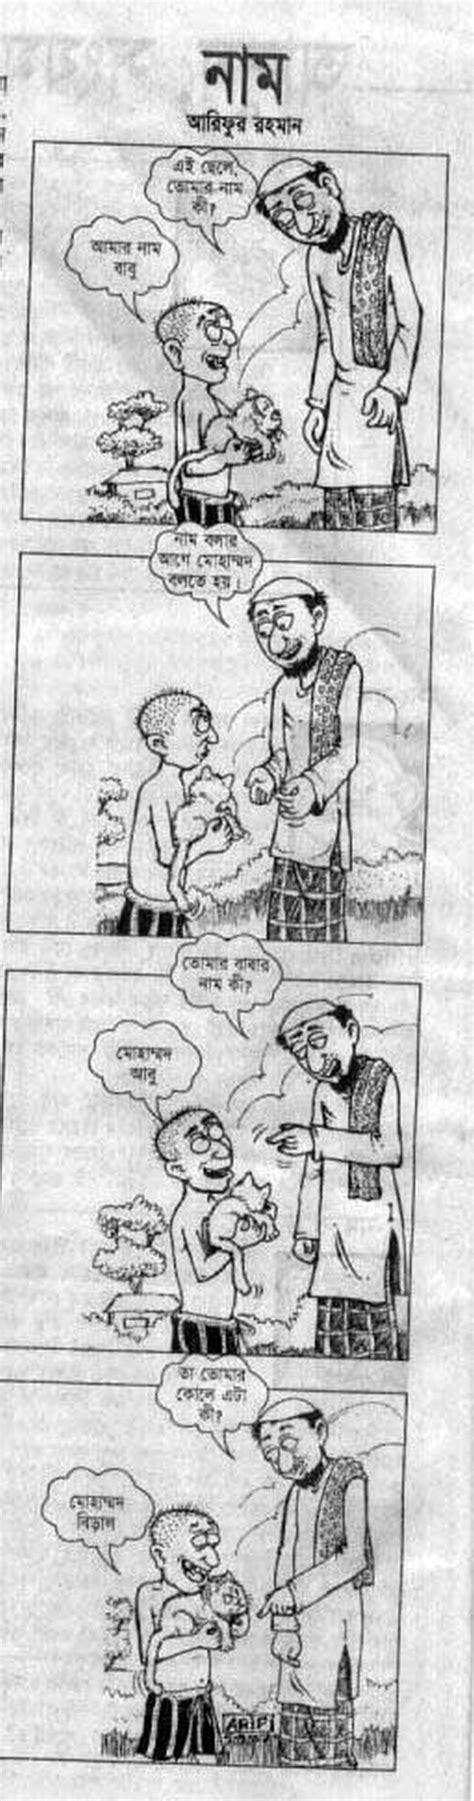 2007 Bangladesh Cartoon Controversy